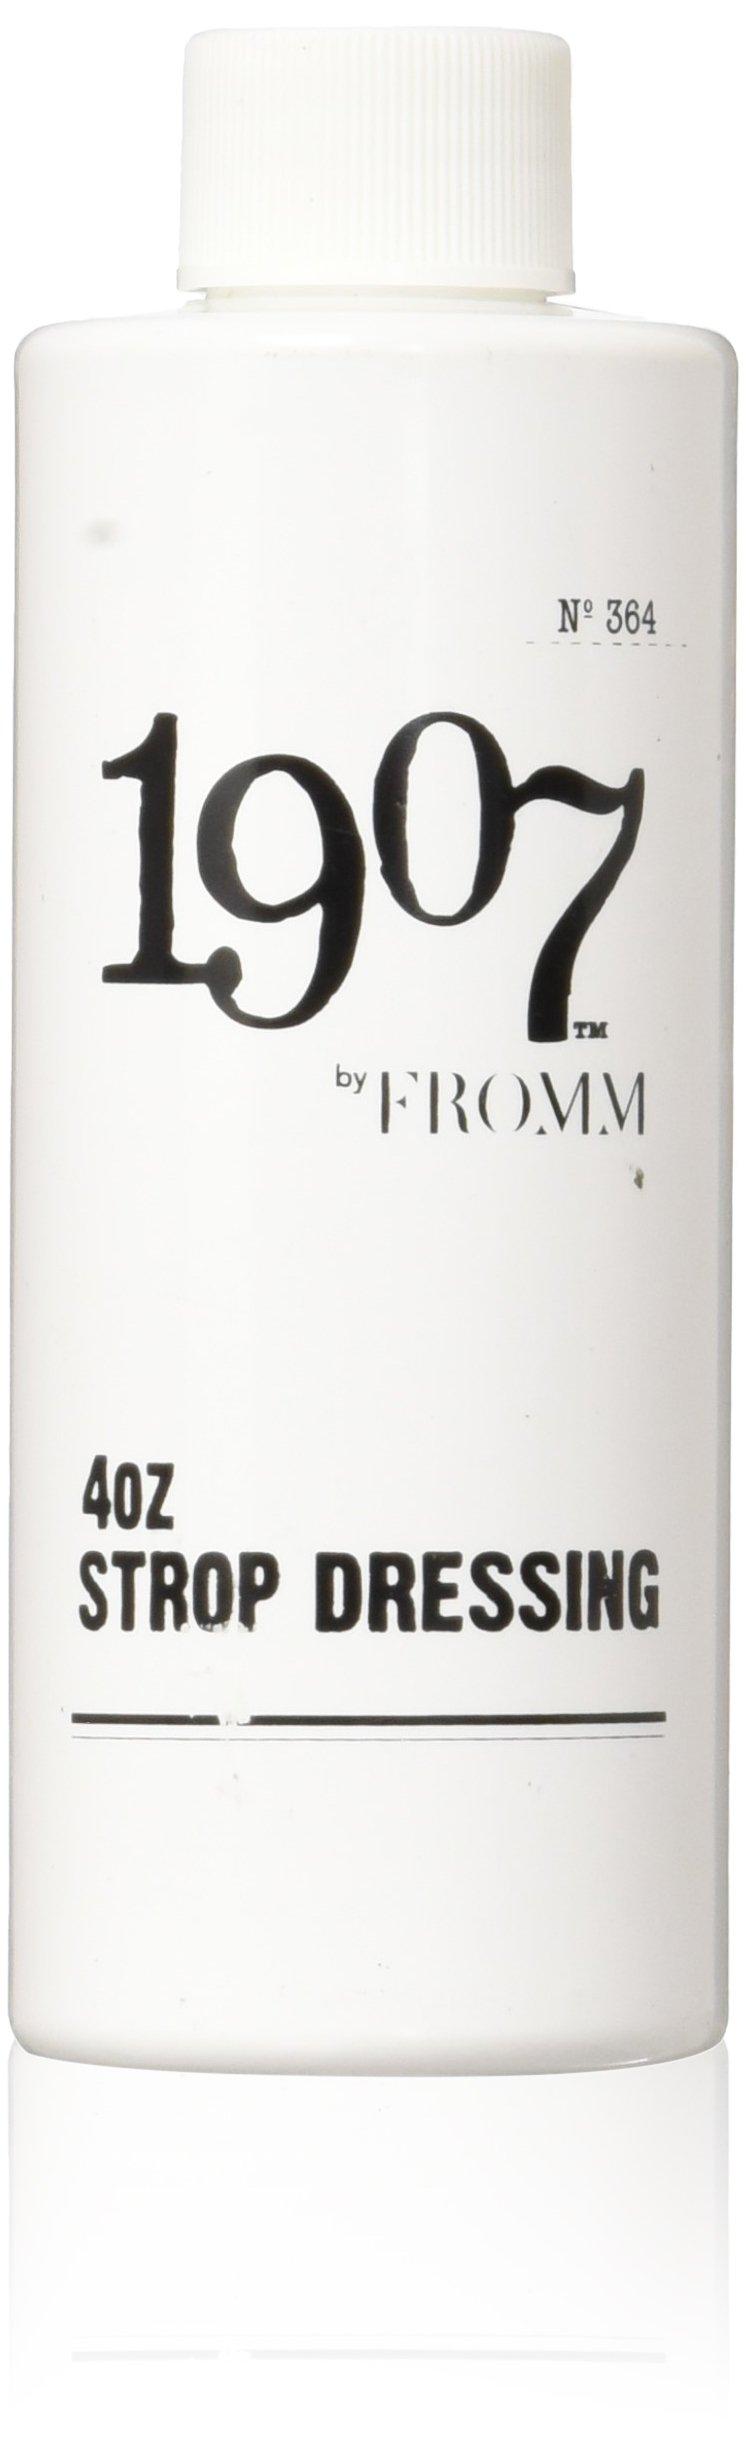 Fromm Strop Dressing 4oz